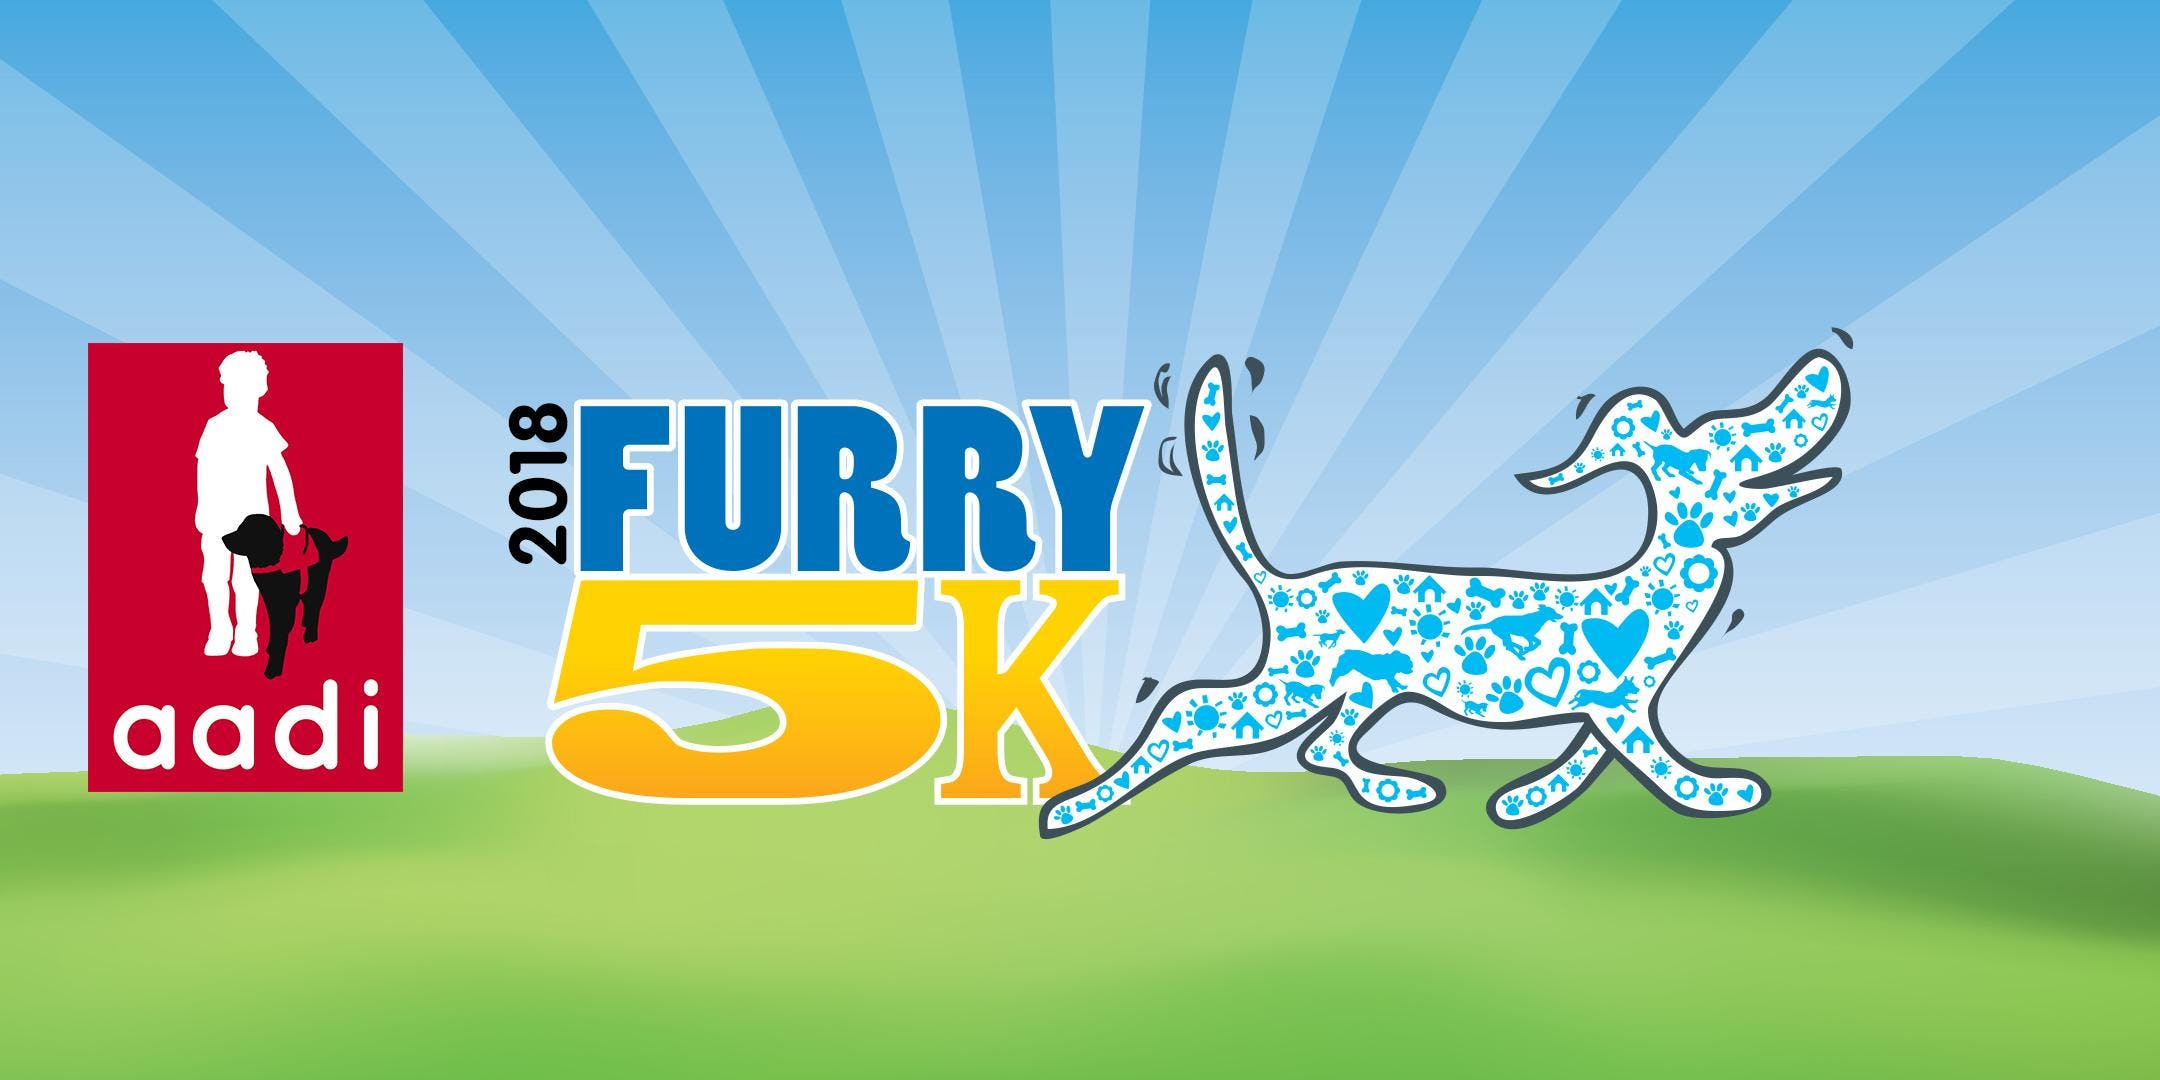 Petworld Tullamore Furry 5k Annual Sponsored Dog Walk 2018